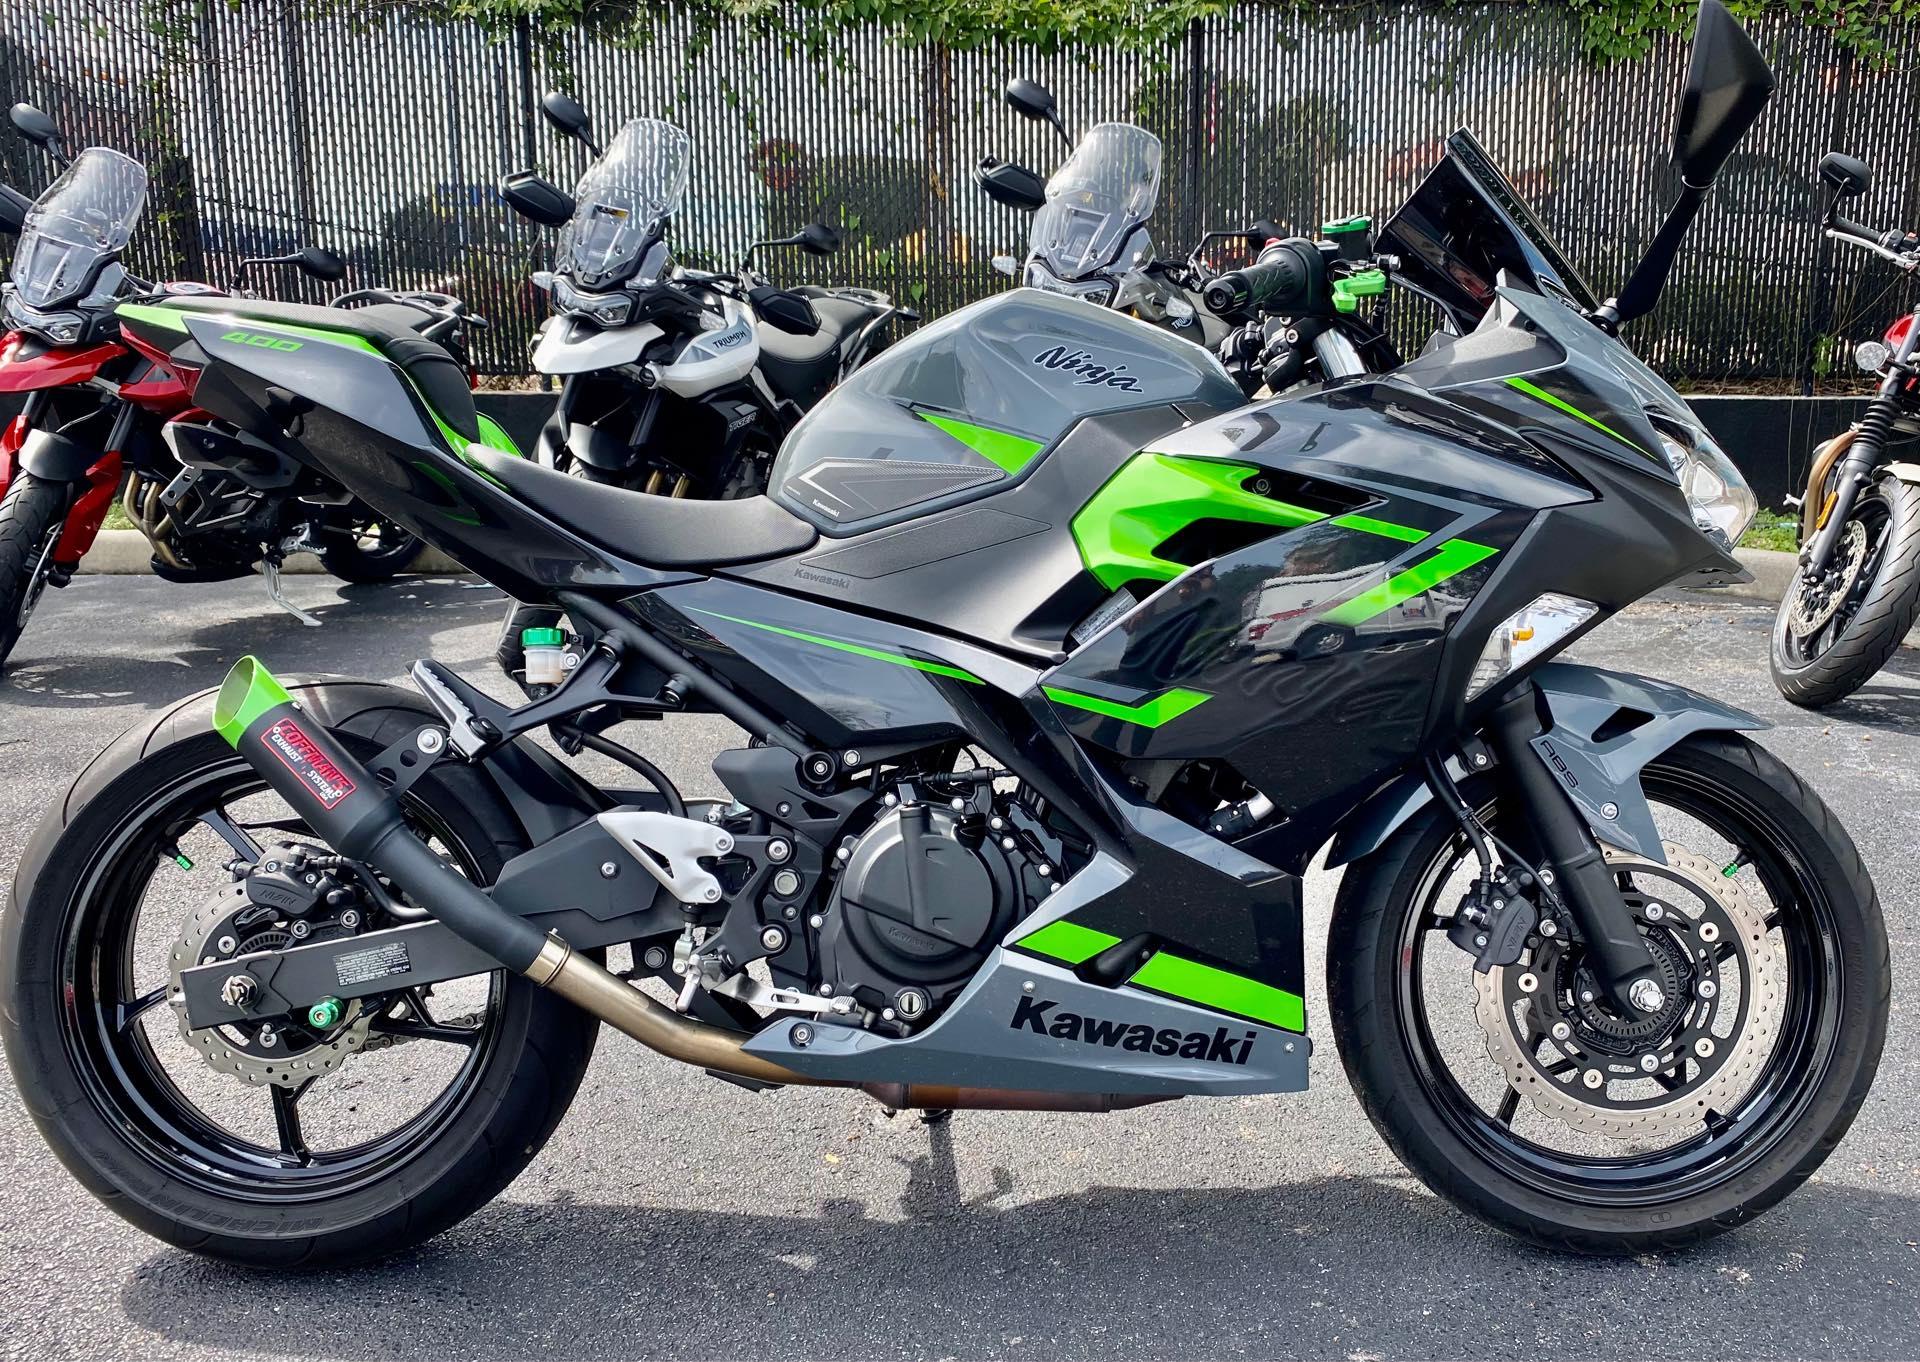 2019 Kawasaki Ninja 400 ABS at Tampa Triumph, Tampa, FL 33614